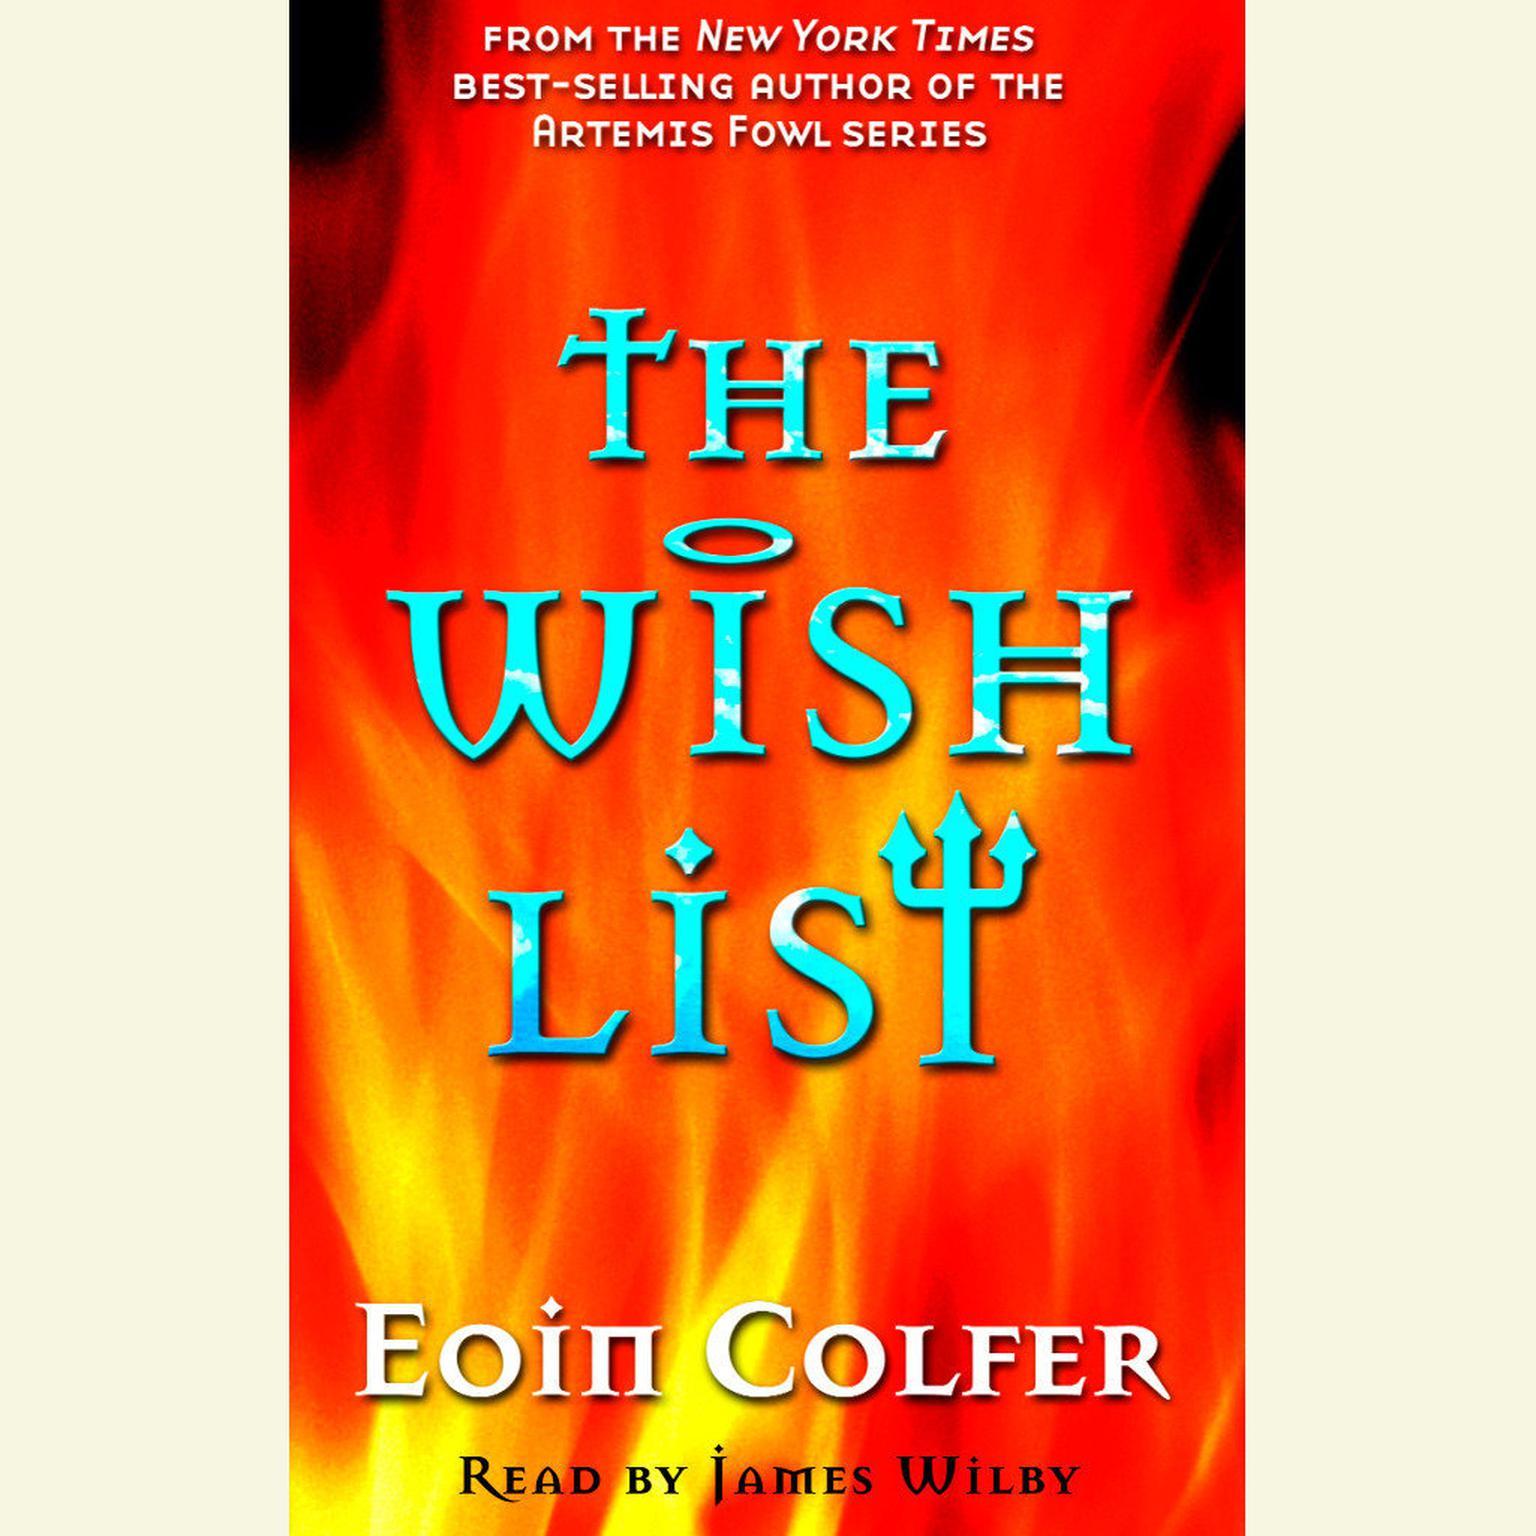 Printable The Wish List Audiobook Cover Art